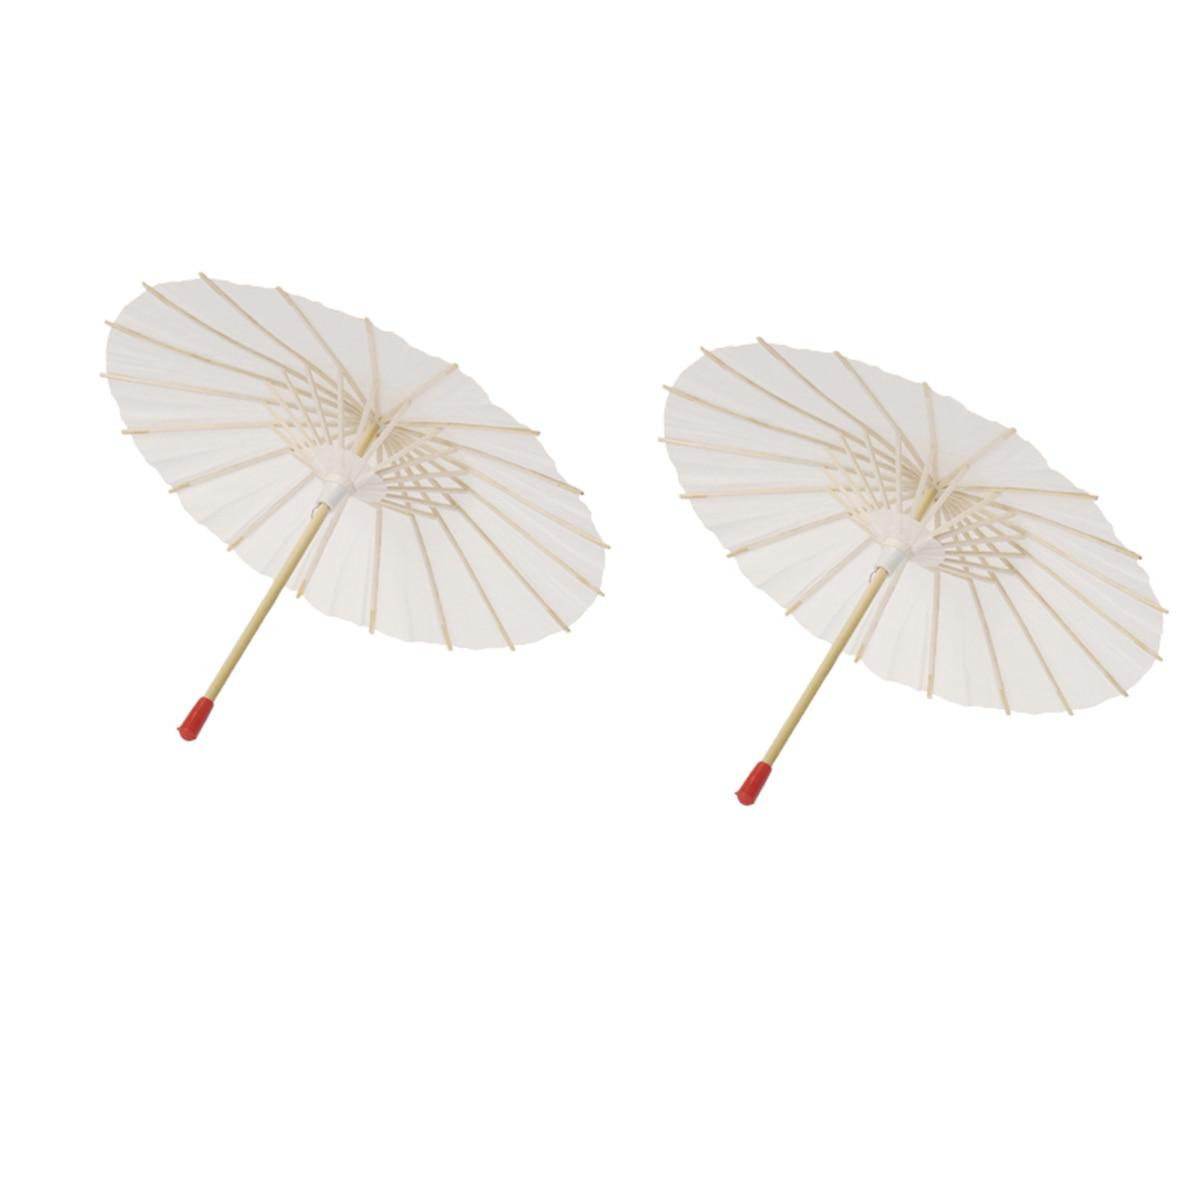 2Pcs White Paper Parasol Craft Decorative Chinese Japanese Paper Umbrella For Baby Shower Anniversary Wedding Birthday